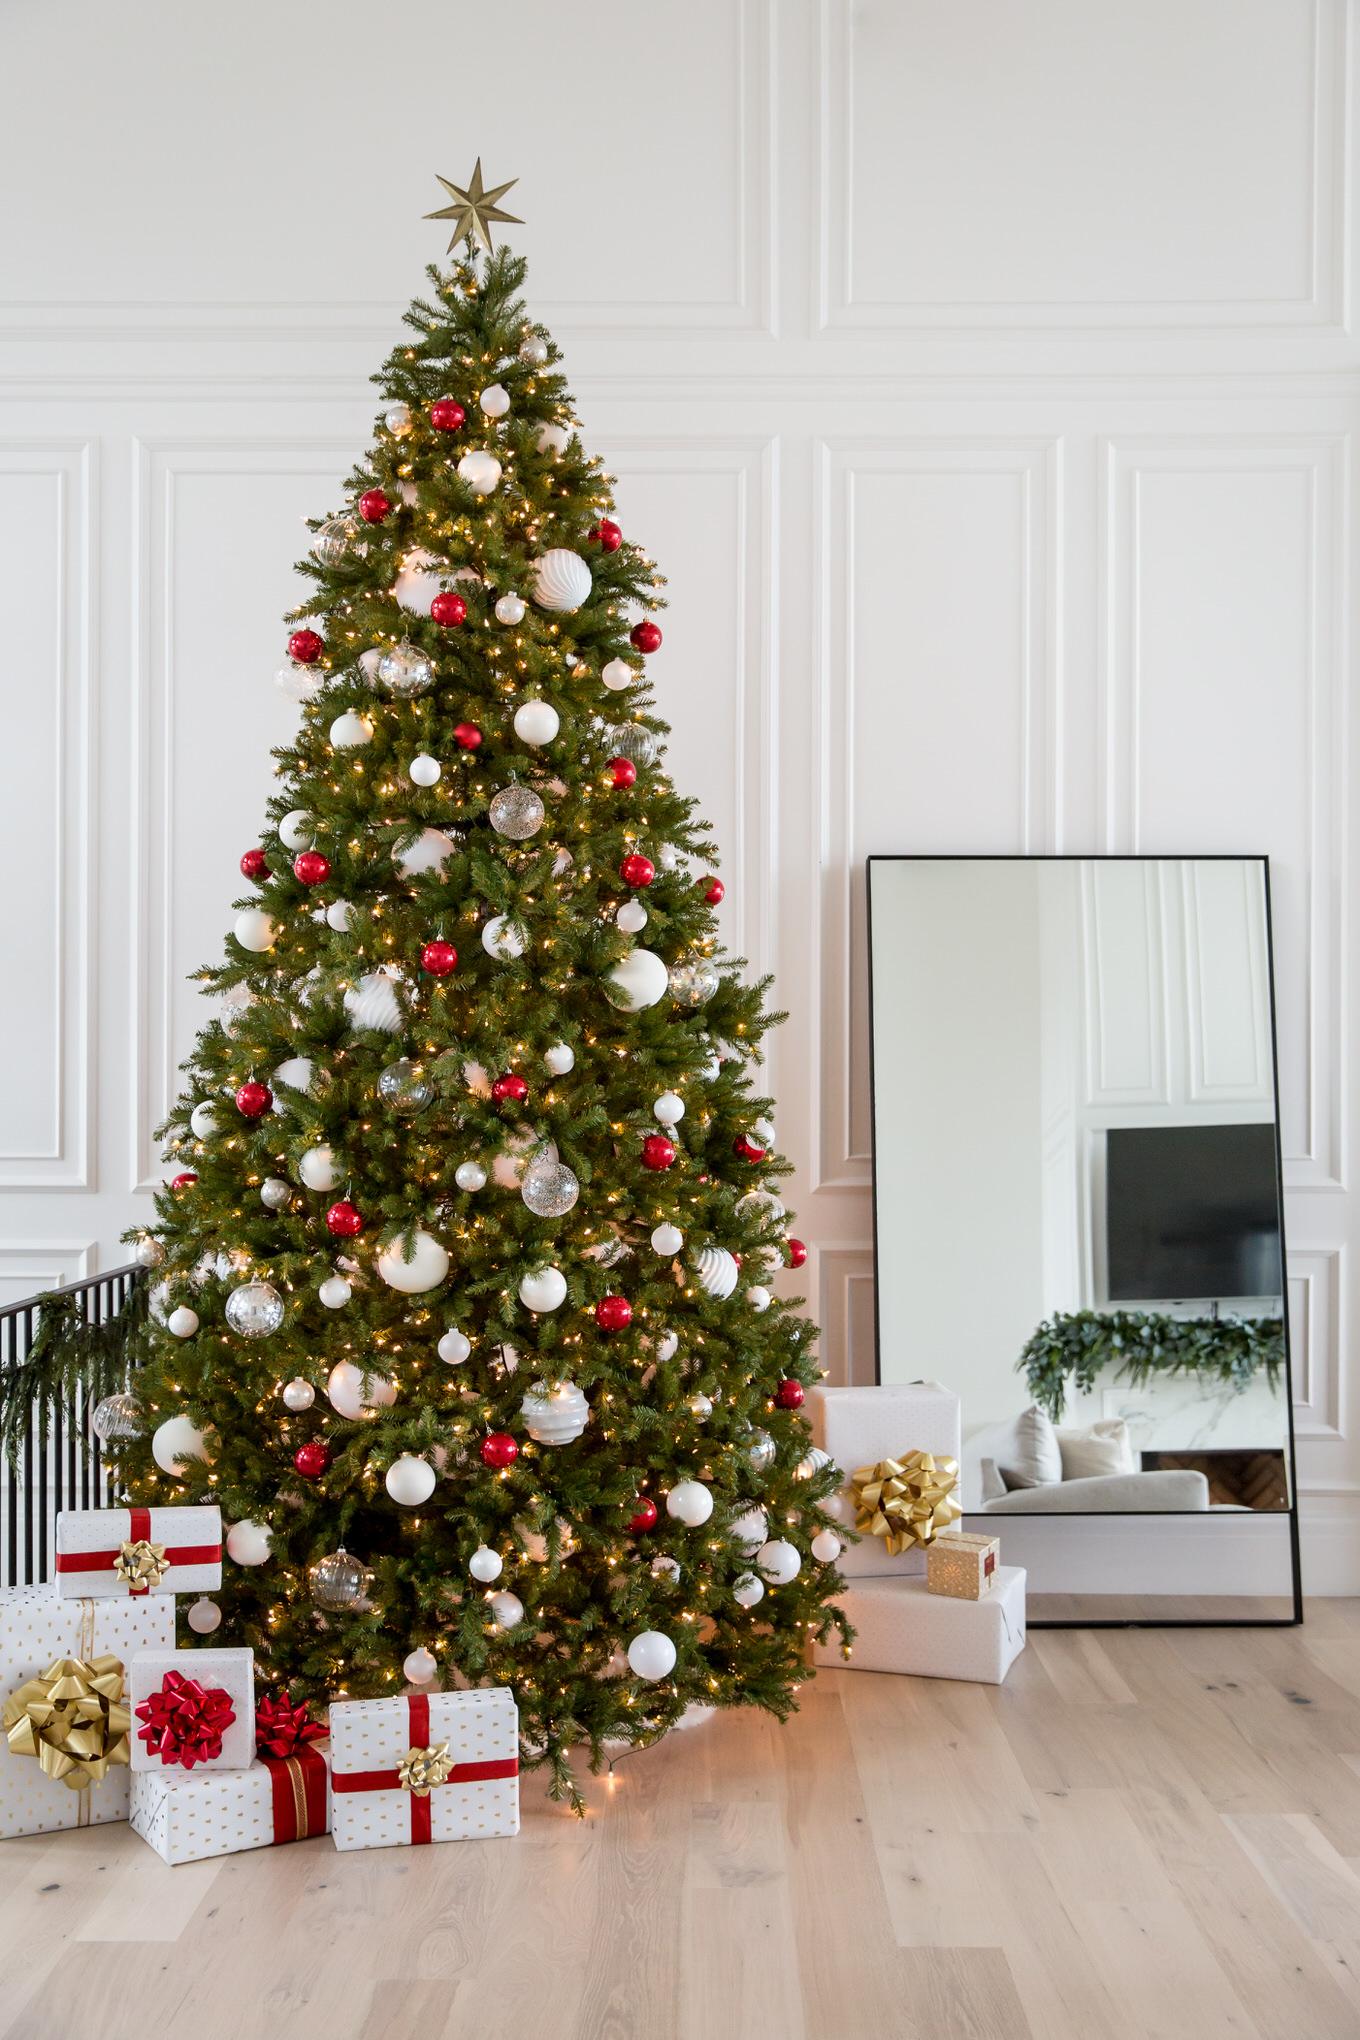 classic evergreen Christmas tree